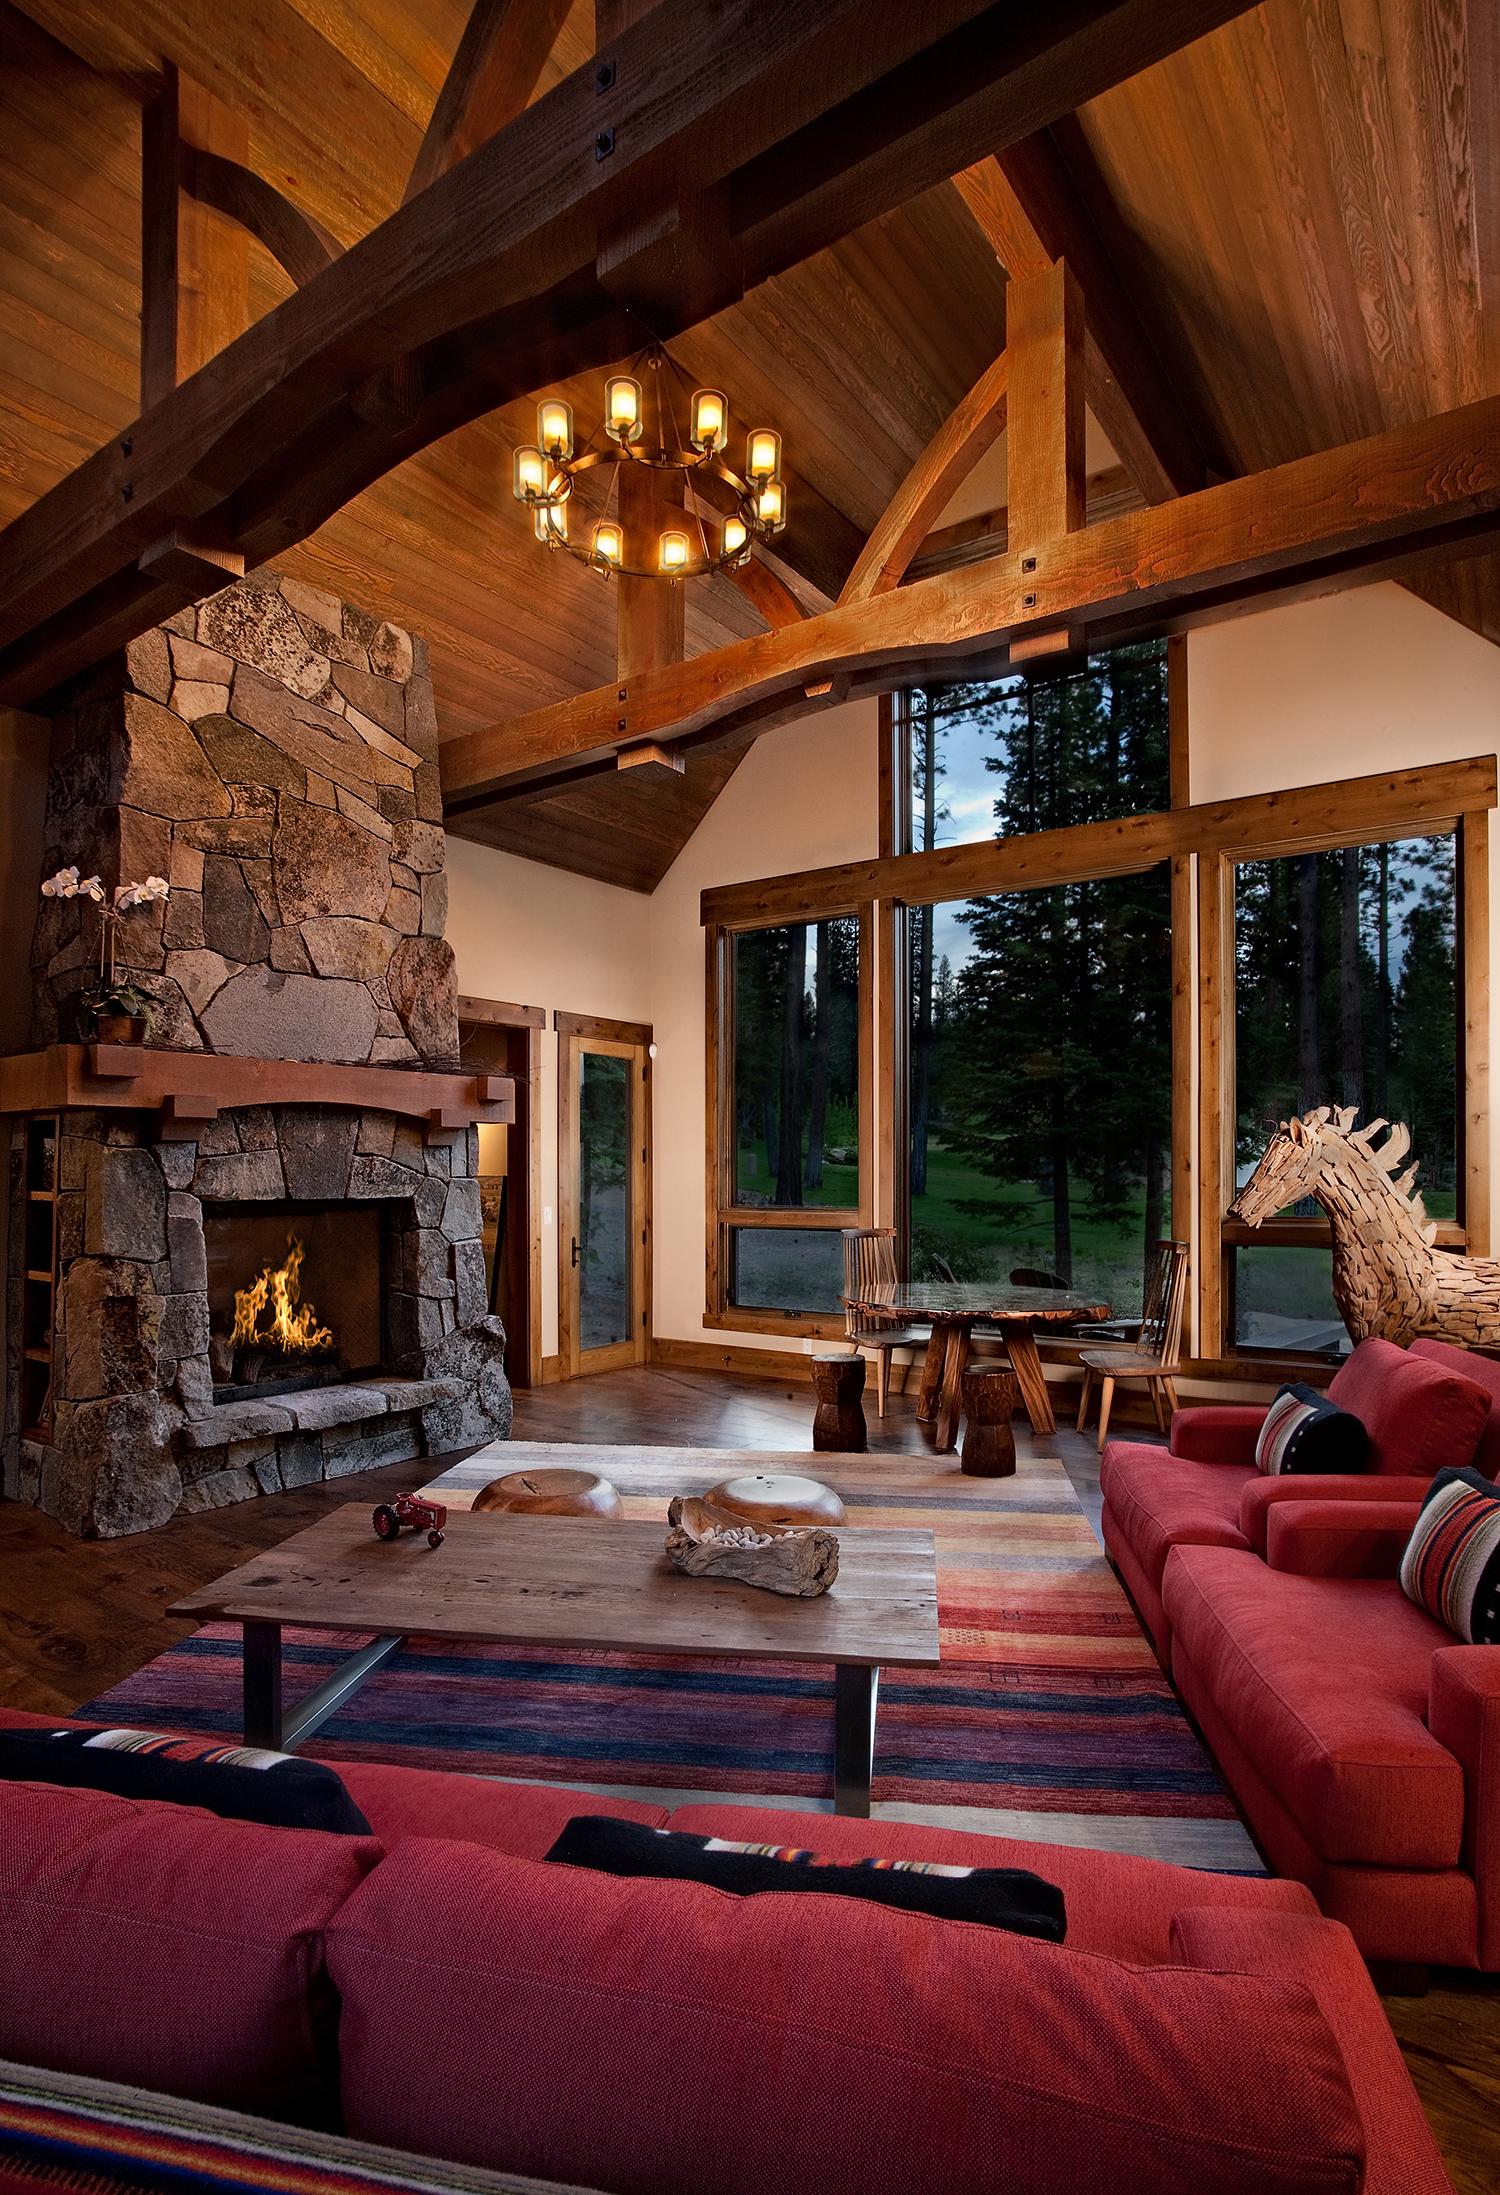 Lot 224_Living Room_Wood Ceilings_Wood Beams_Fireplace_Masonry.jpg